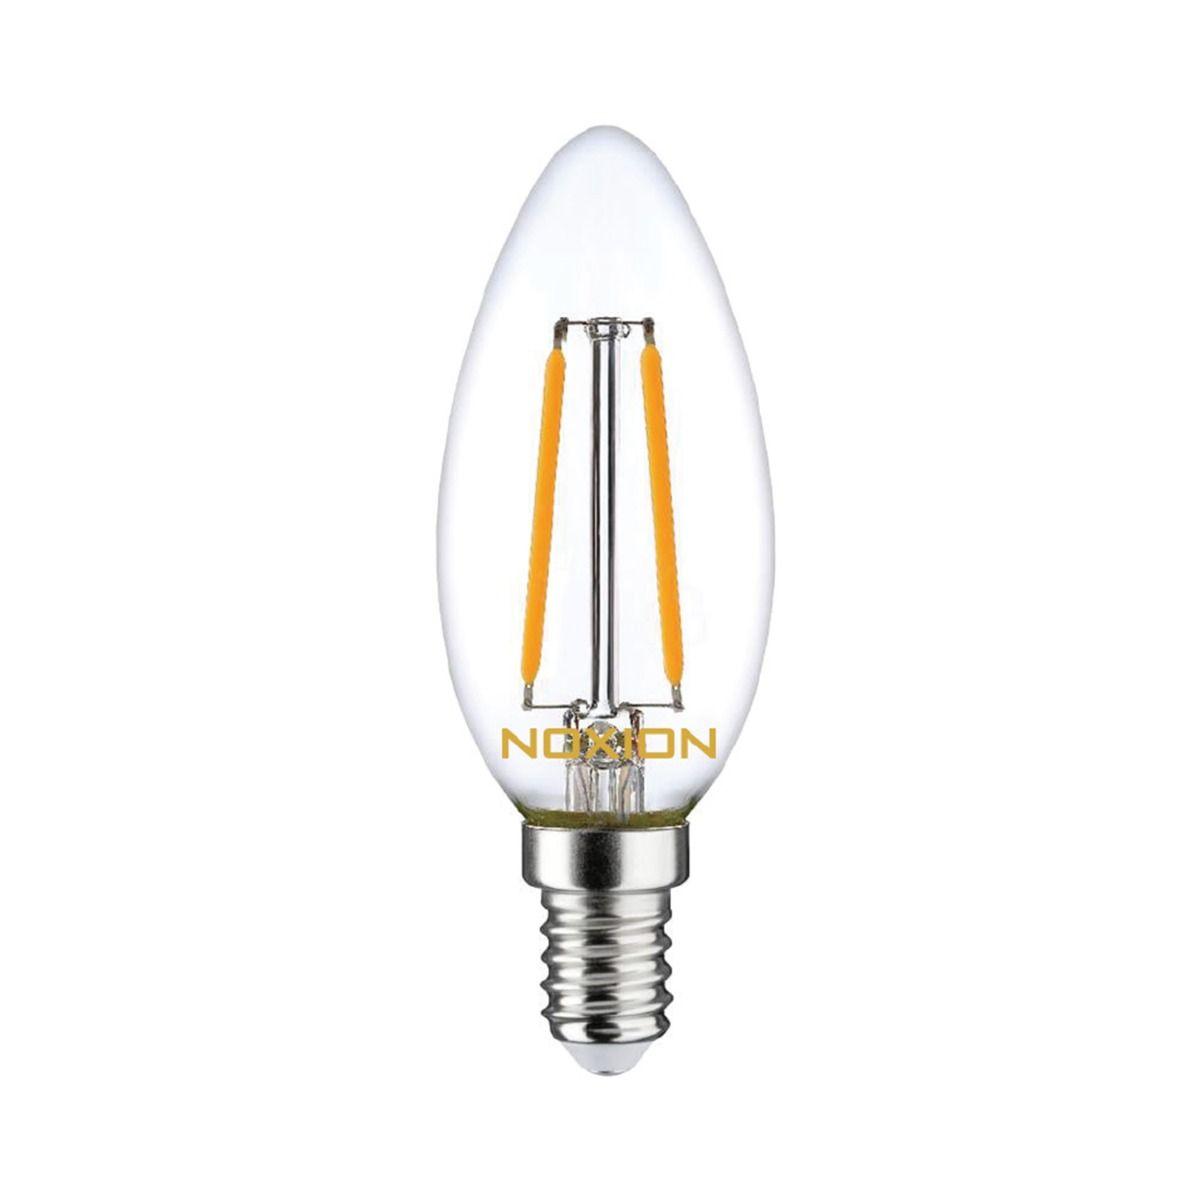 Noxion Lucent Fadenlampe LED Kerze B35 E14 2.5W 250lm 827 | Dimmbar - Extra Warmweiß - Ersatz für 25W